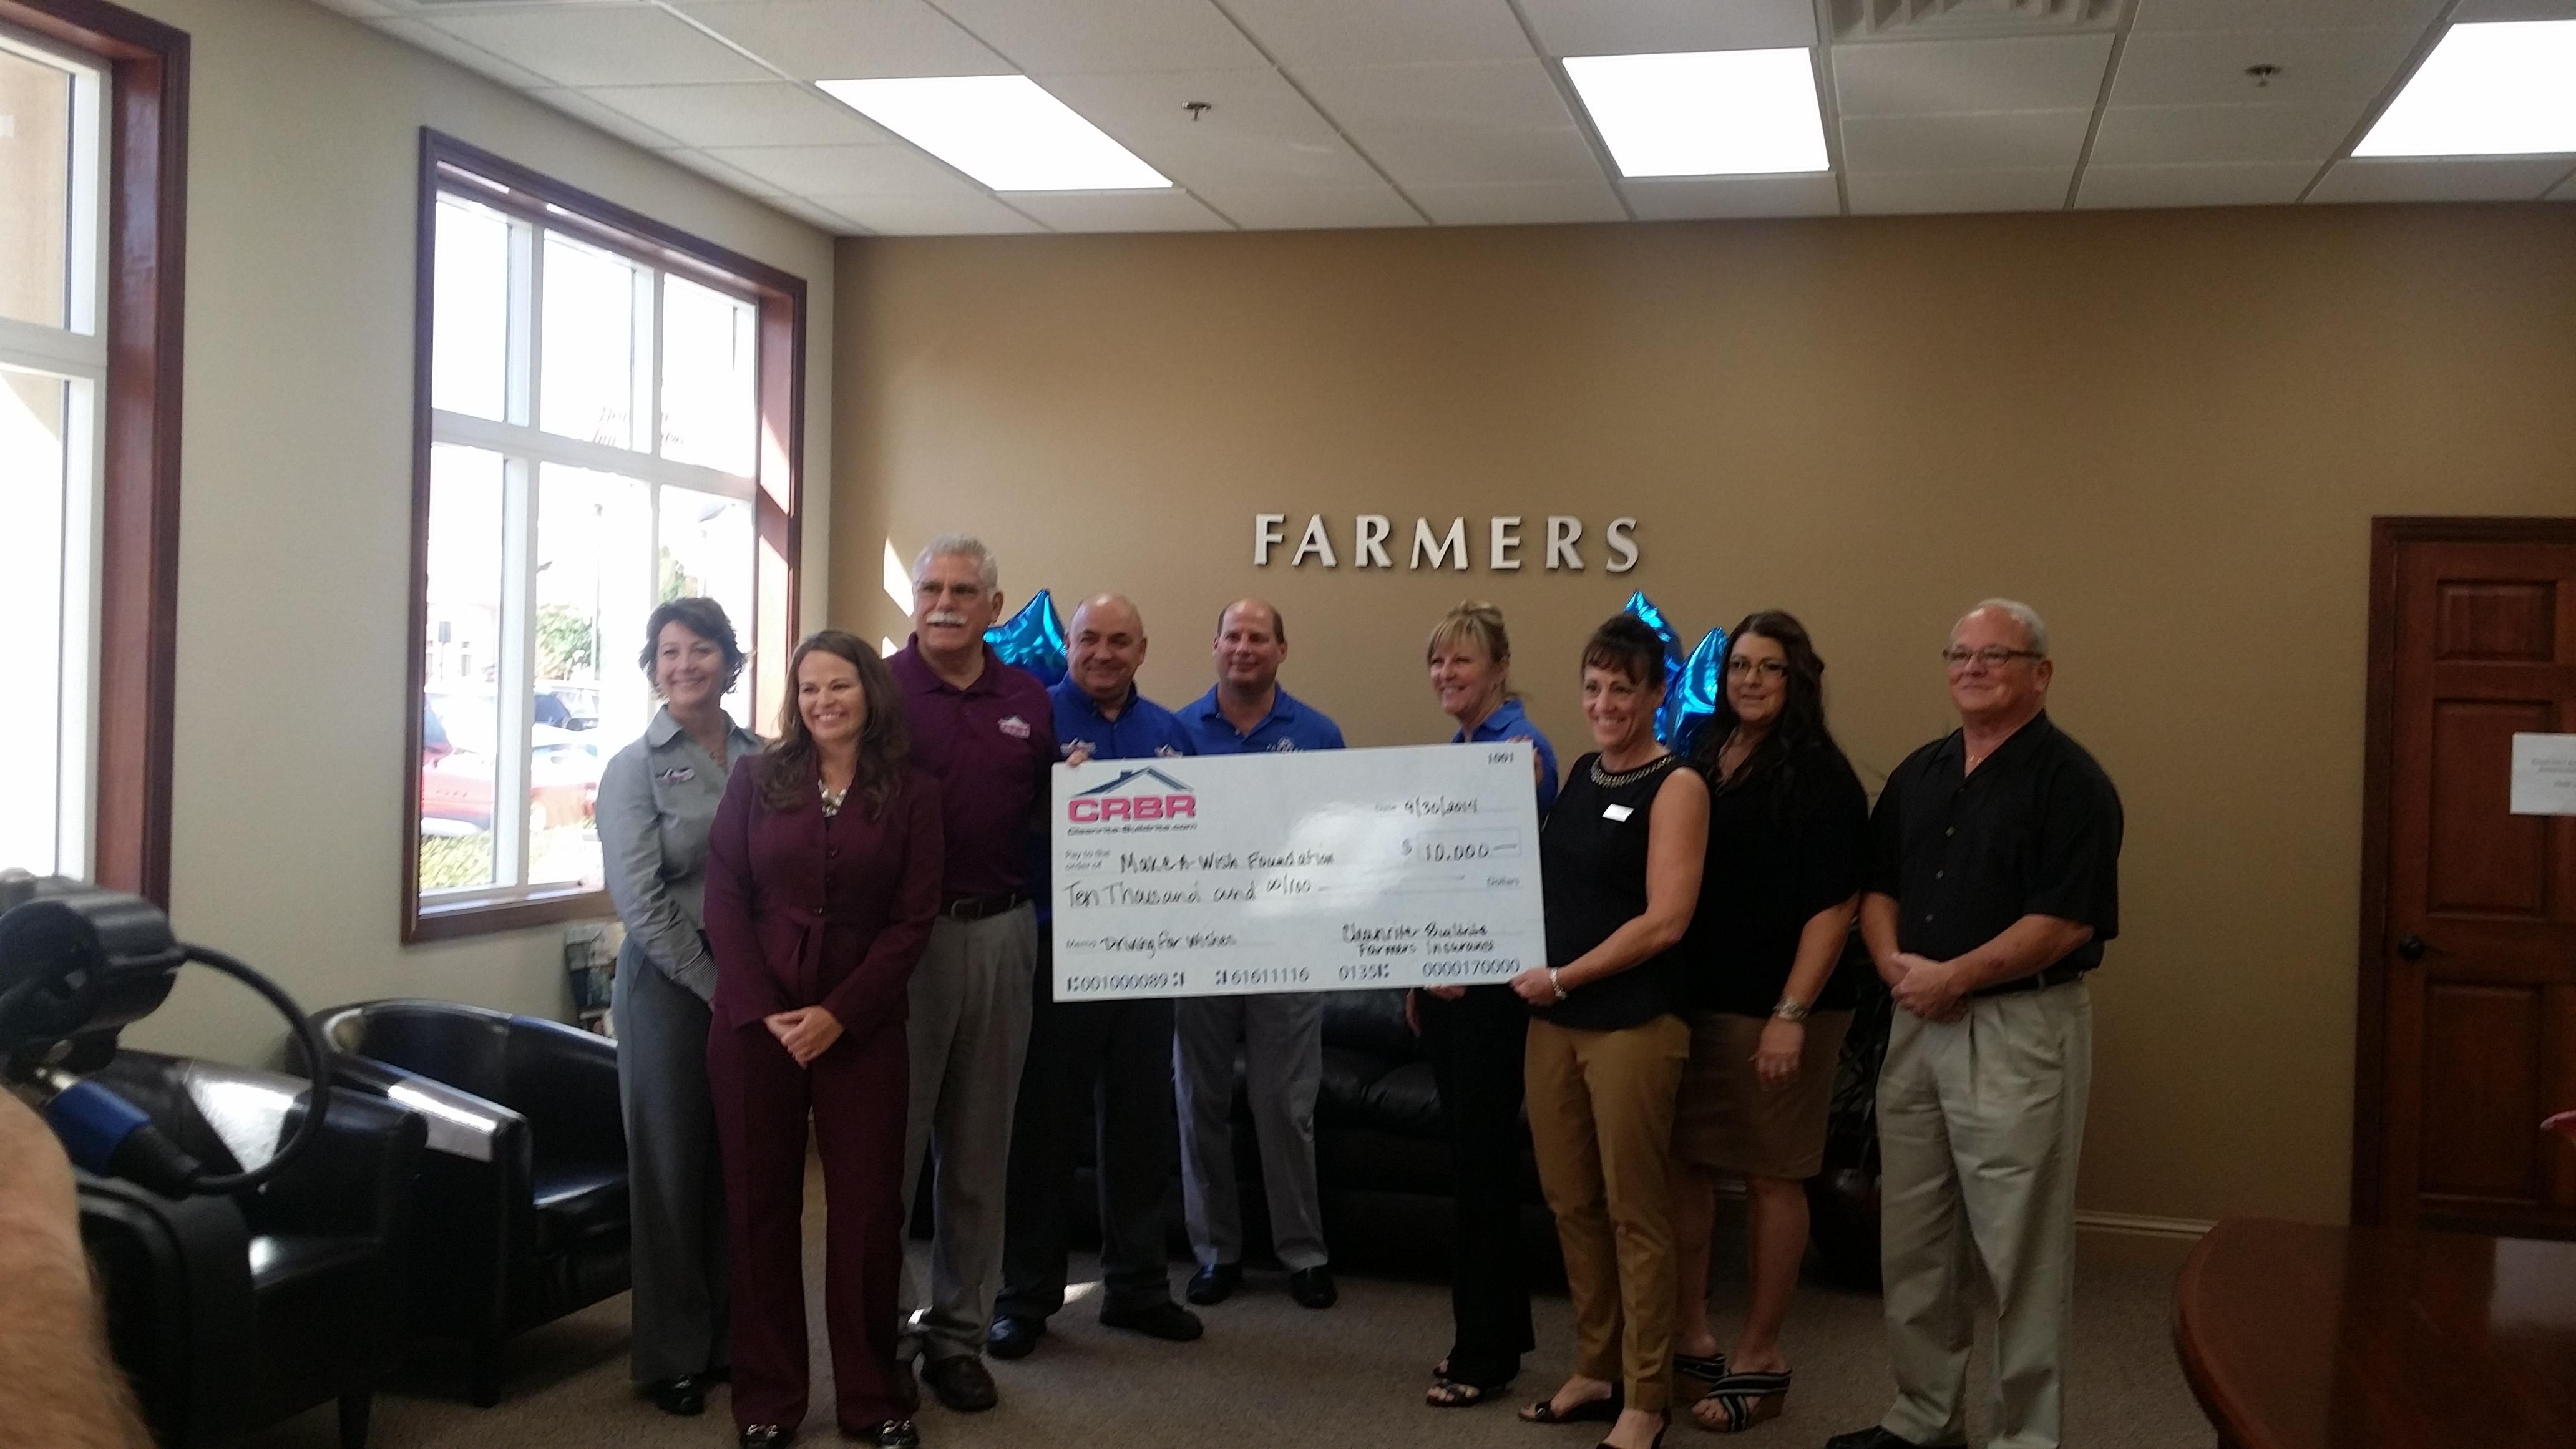 Farmers Insurance - Jessica Graves image 1